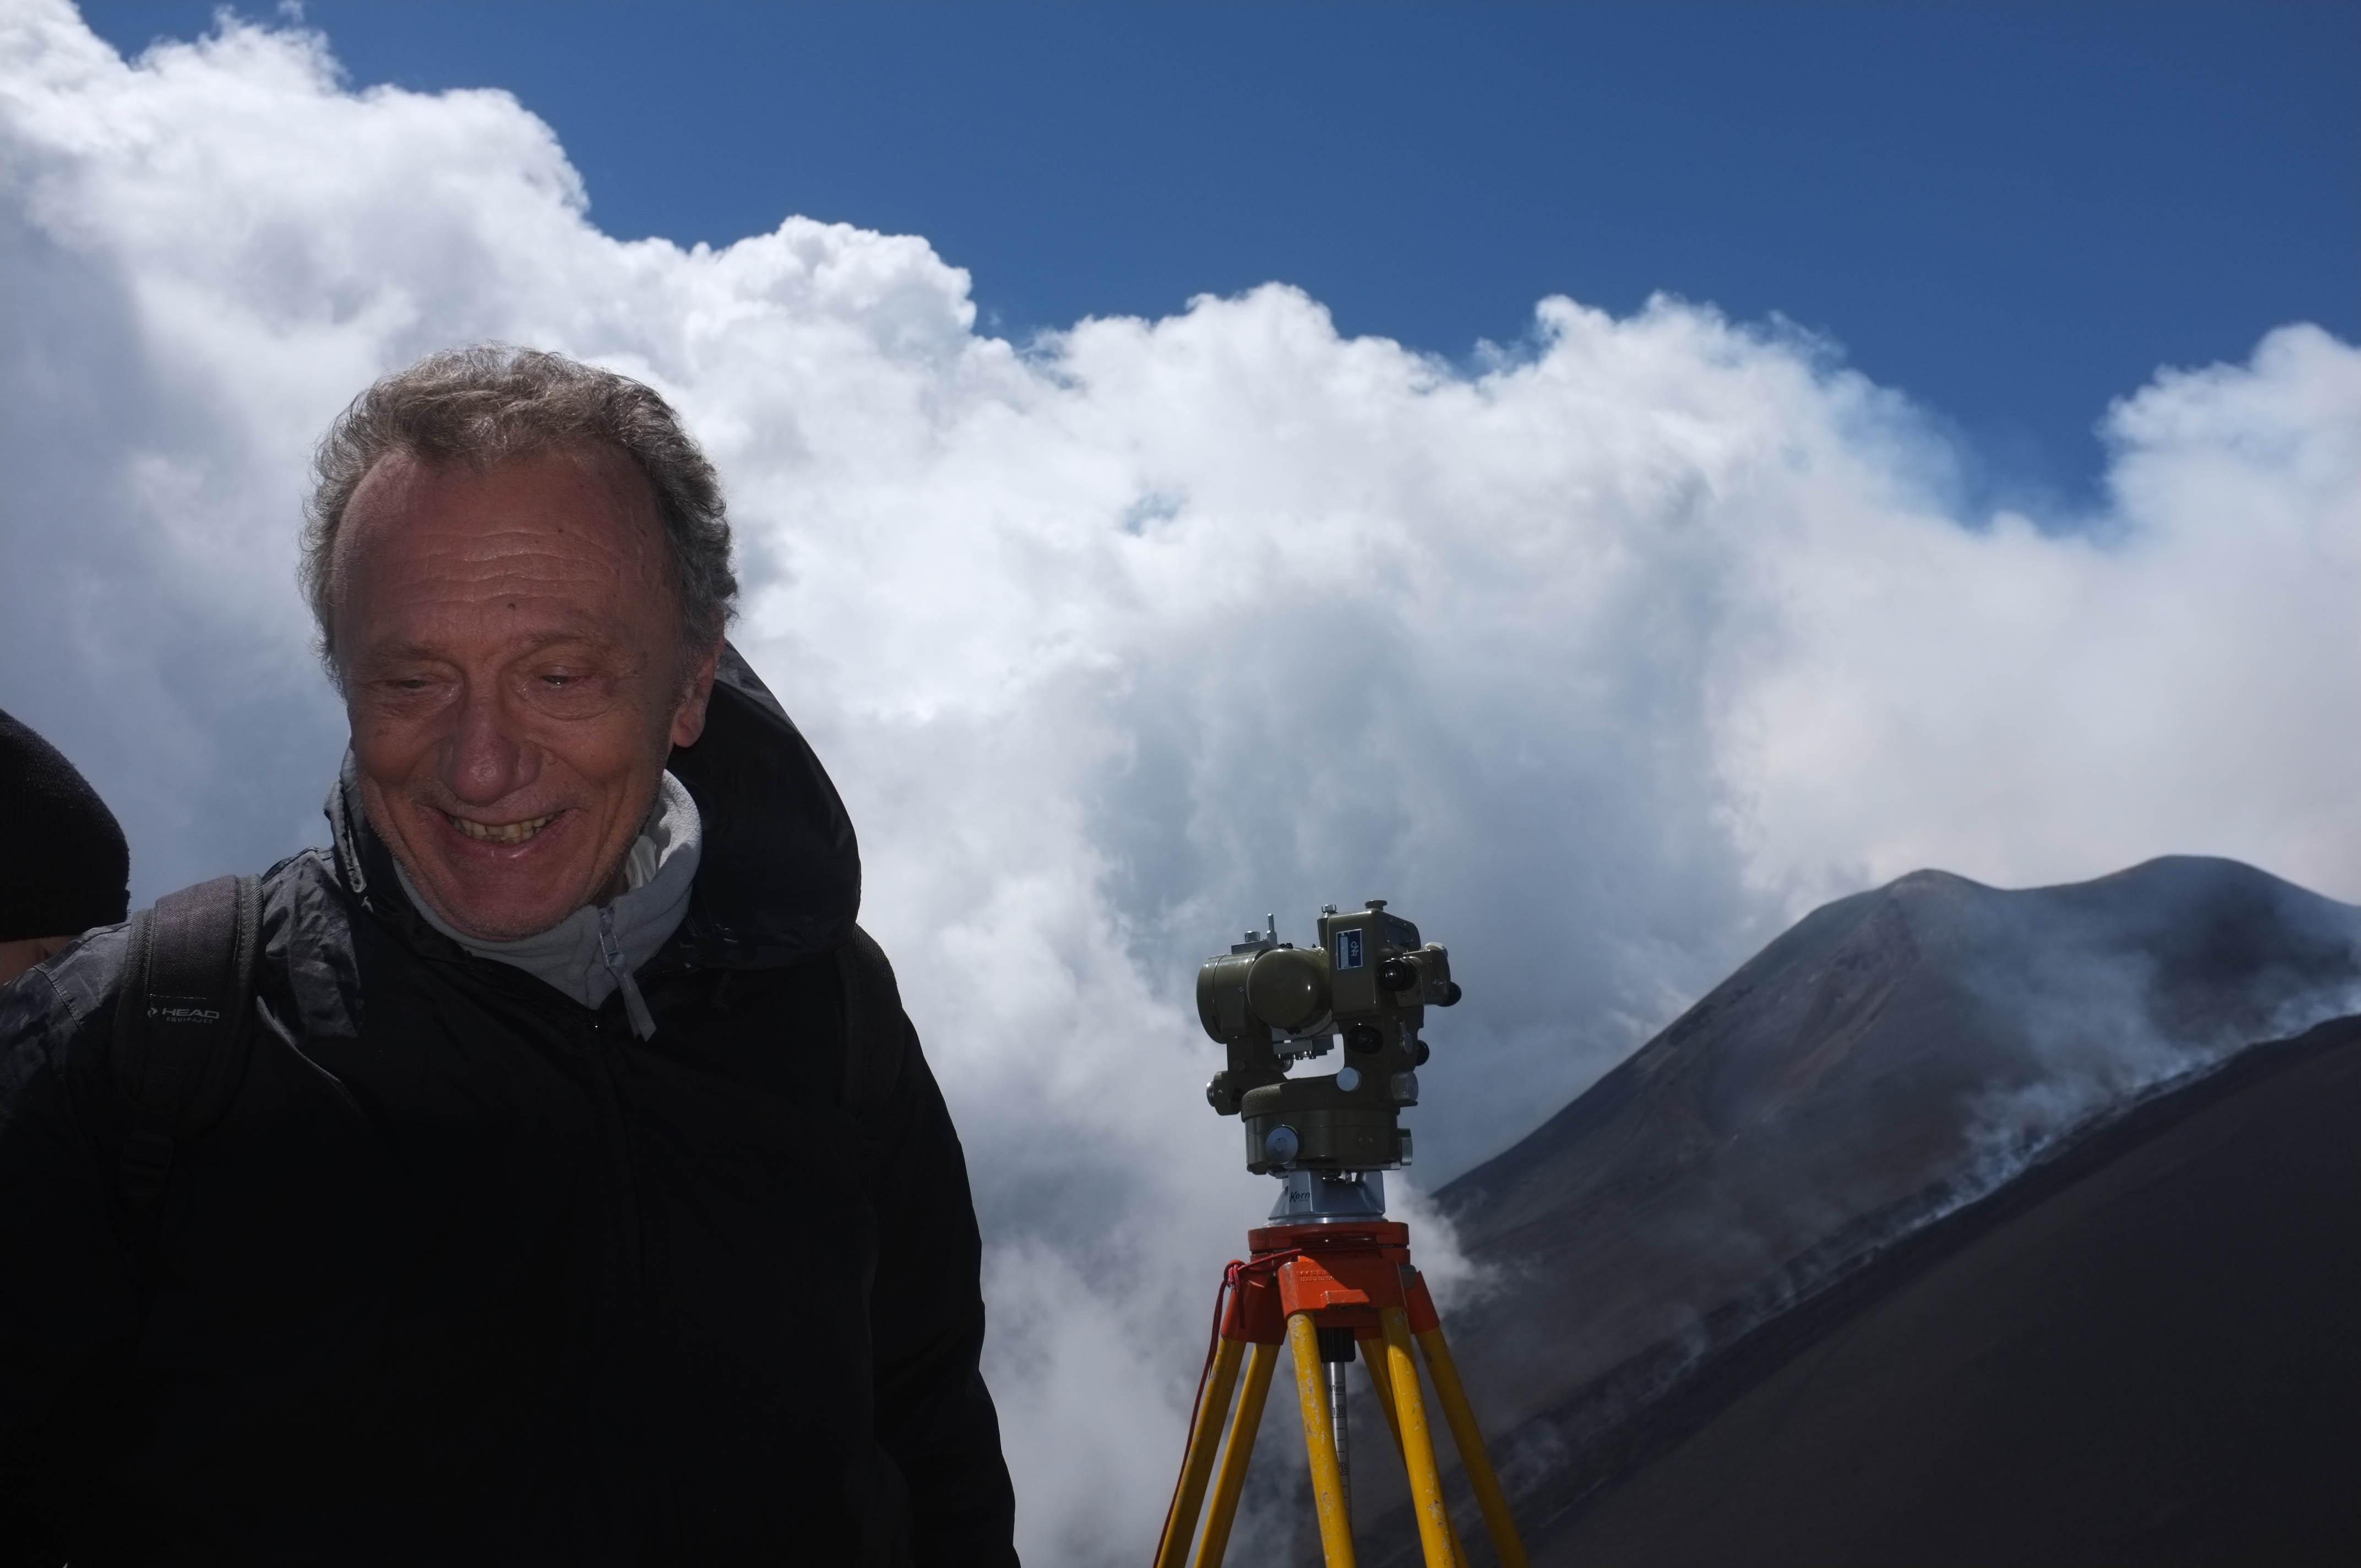 Carlo Laj reçoit la Médaille Arthur Holmes de l'European Geosciences Union (EGU)